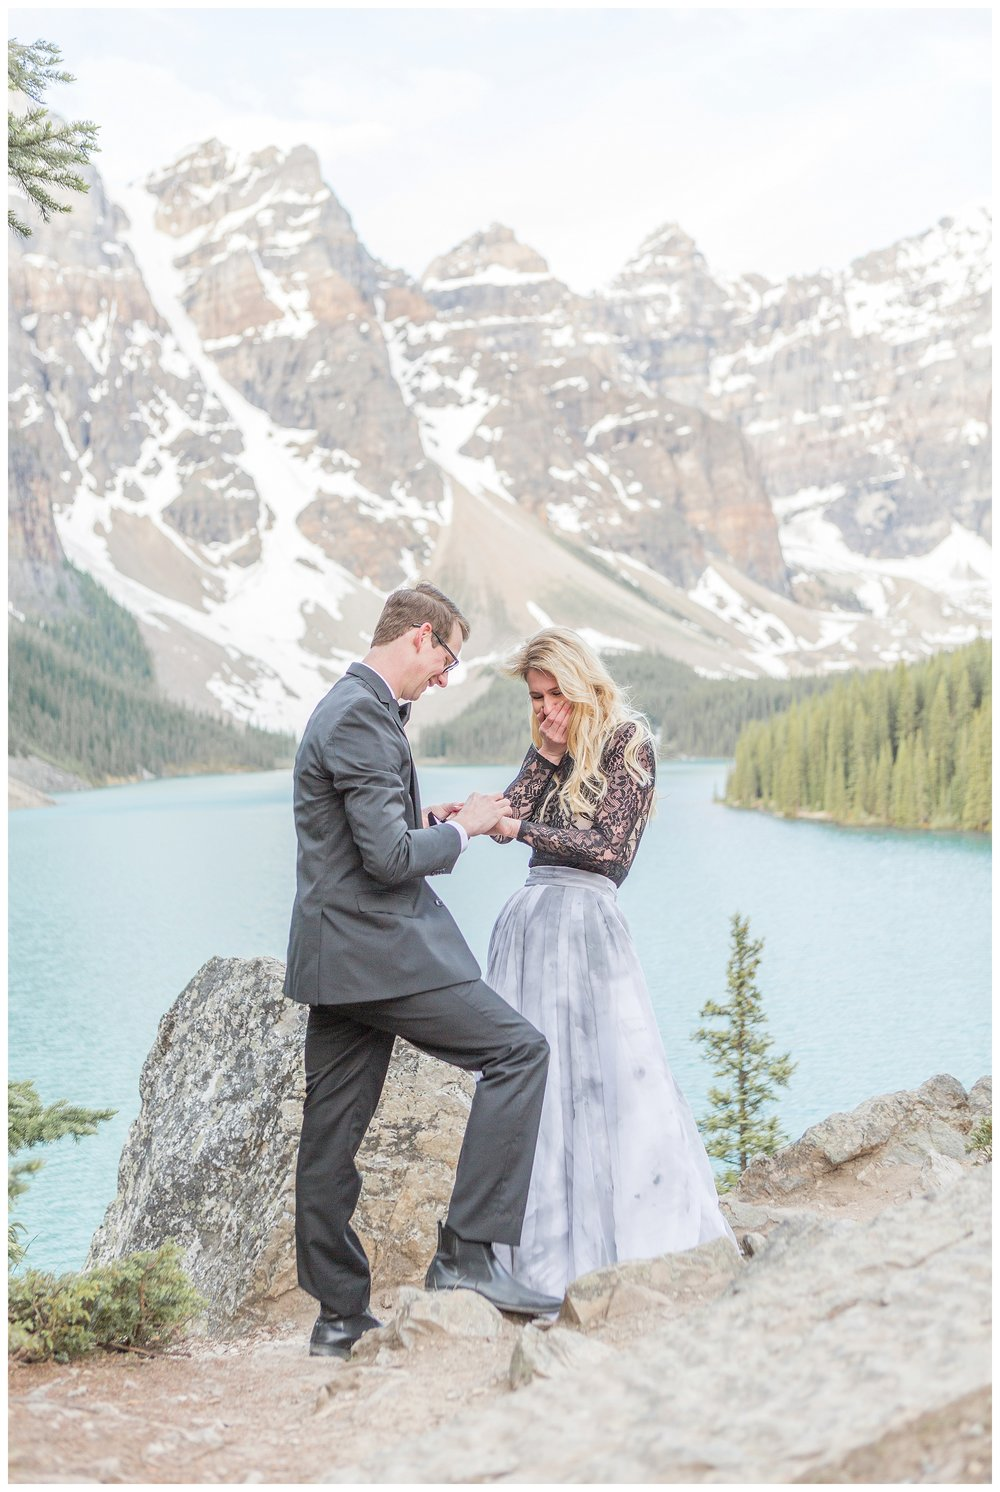 Mountaintop Proposal_0009.jpg